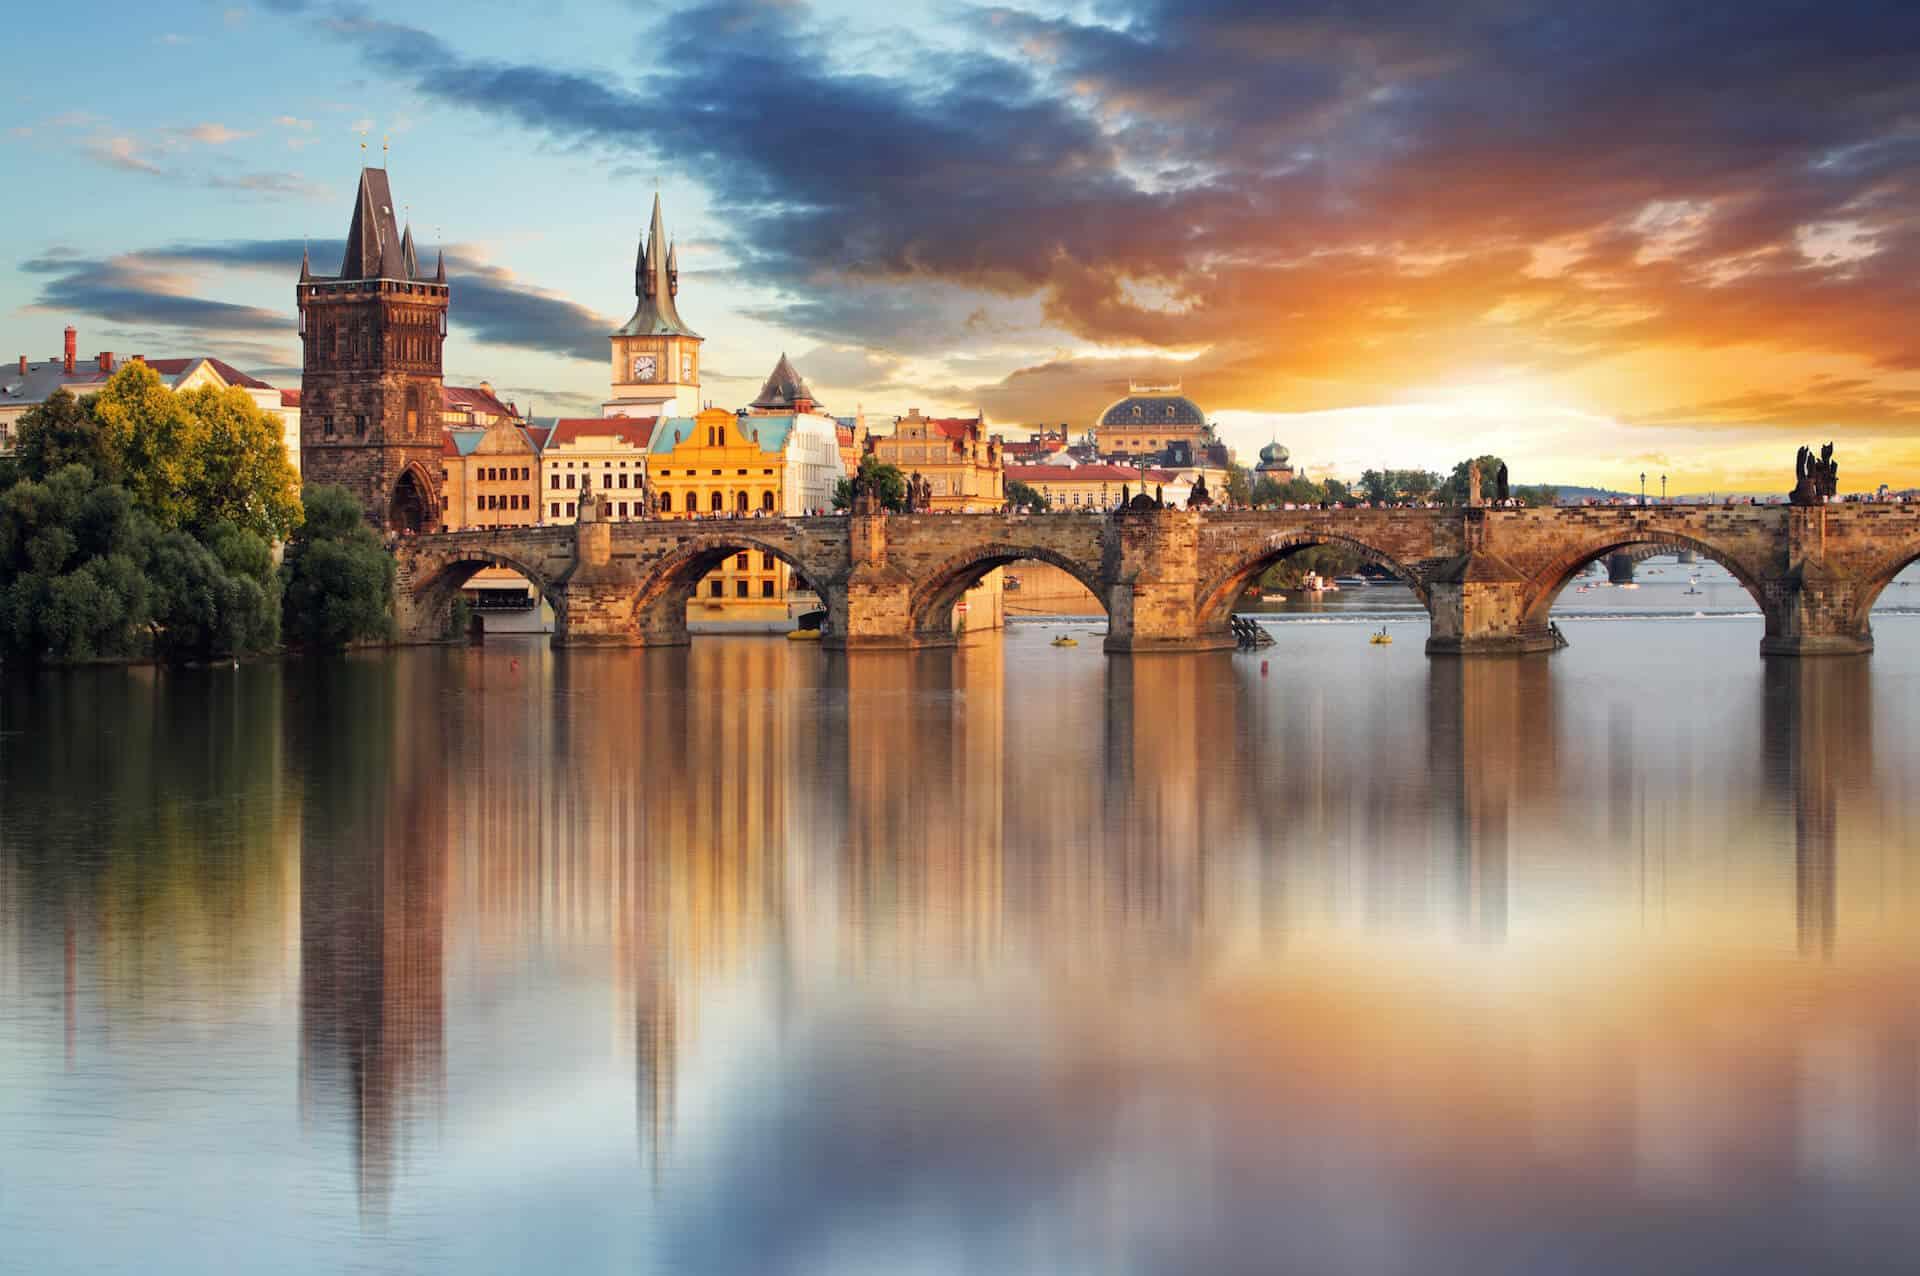 Svatba v Praze, pohled na Karlův most